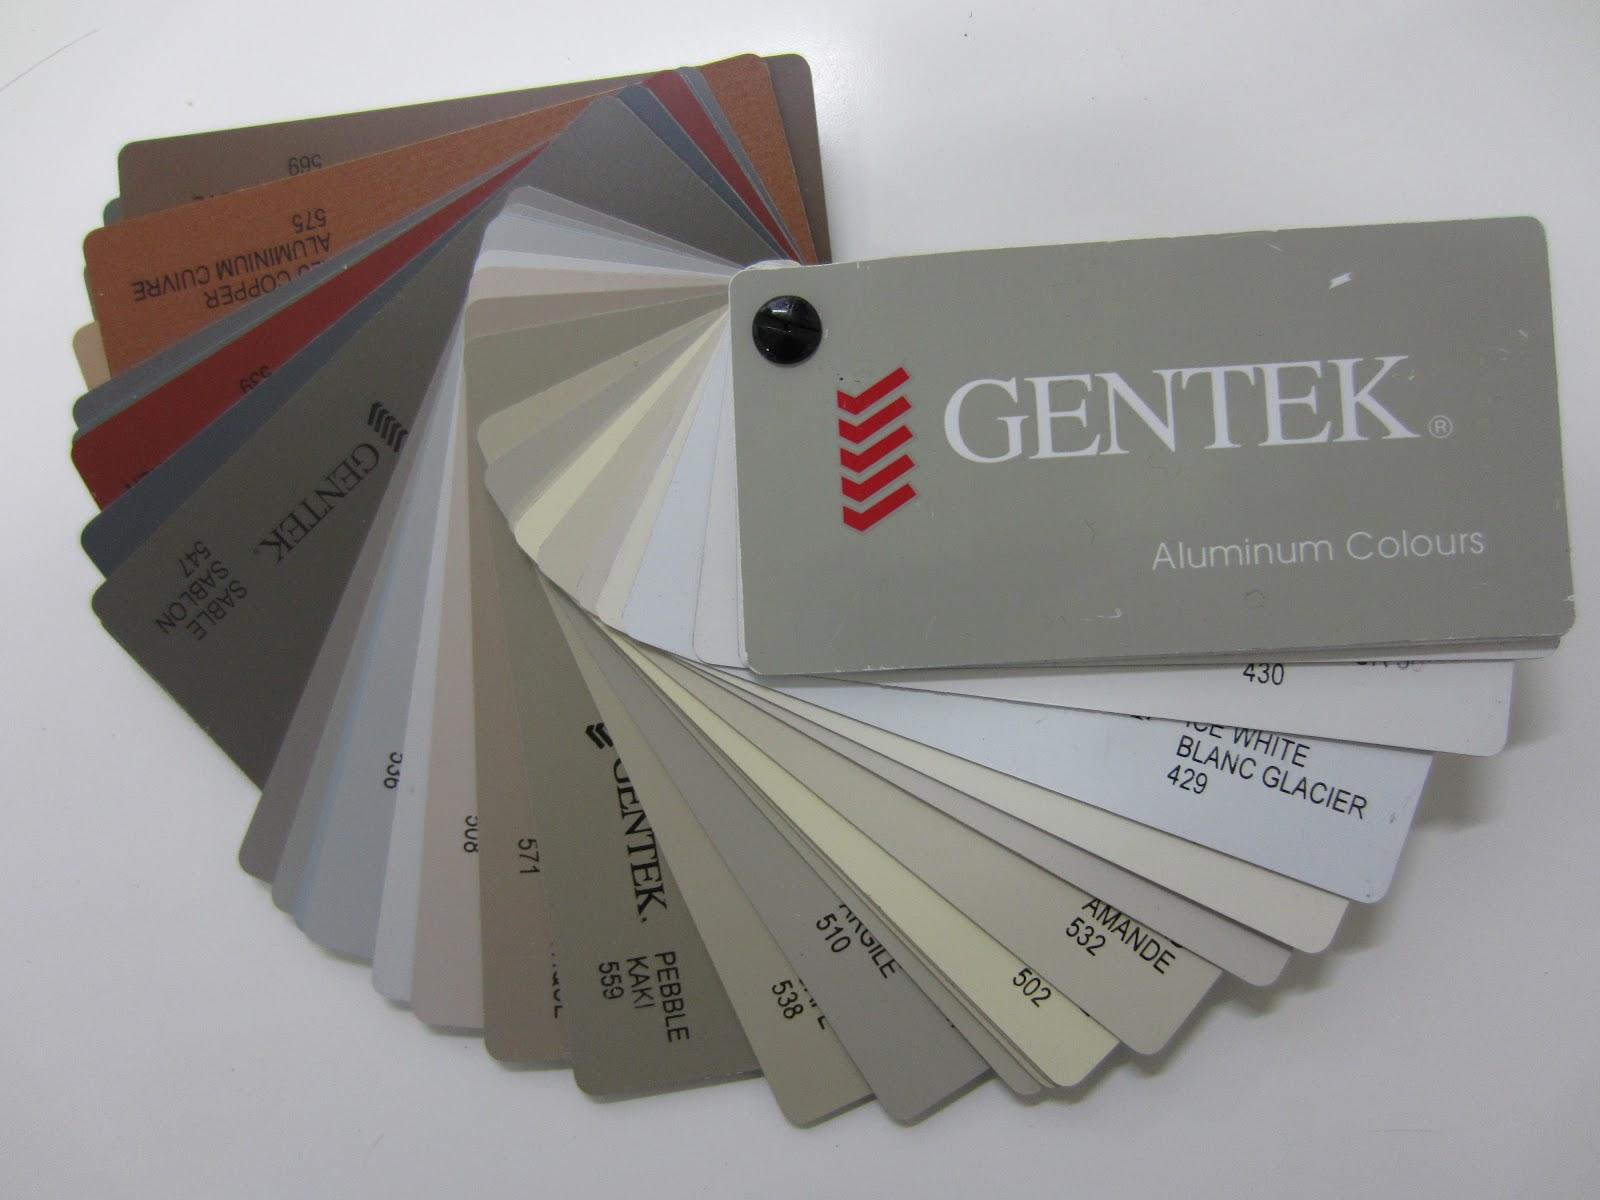 Choosing House Colors The Eavestrough Company Eavestrough Colours